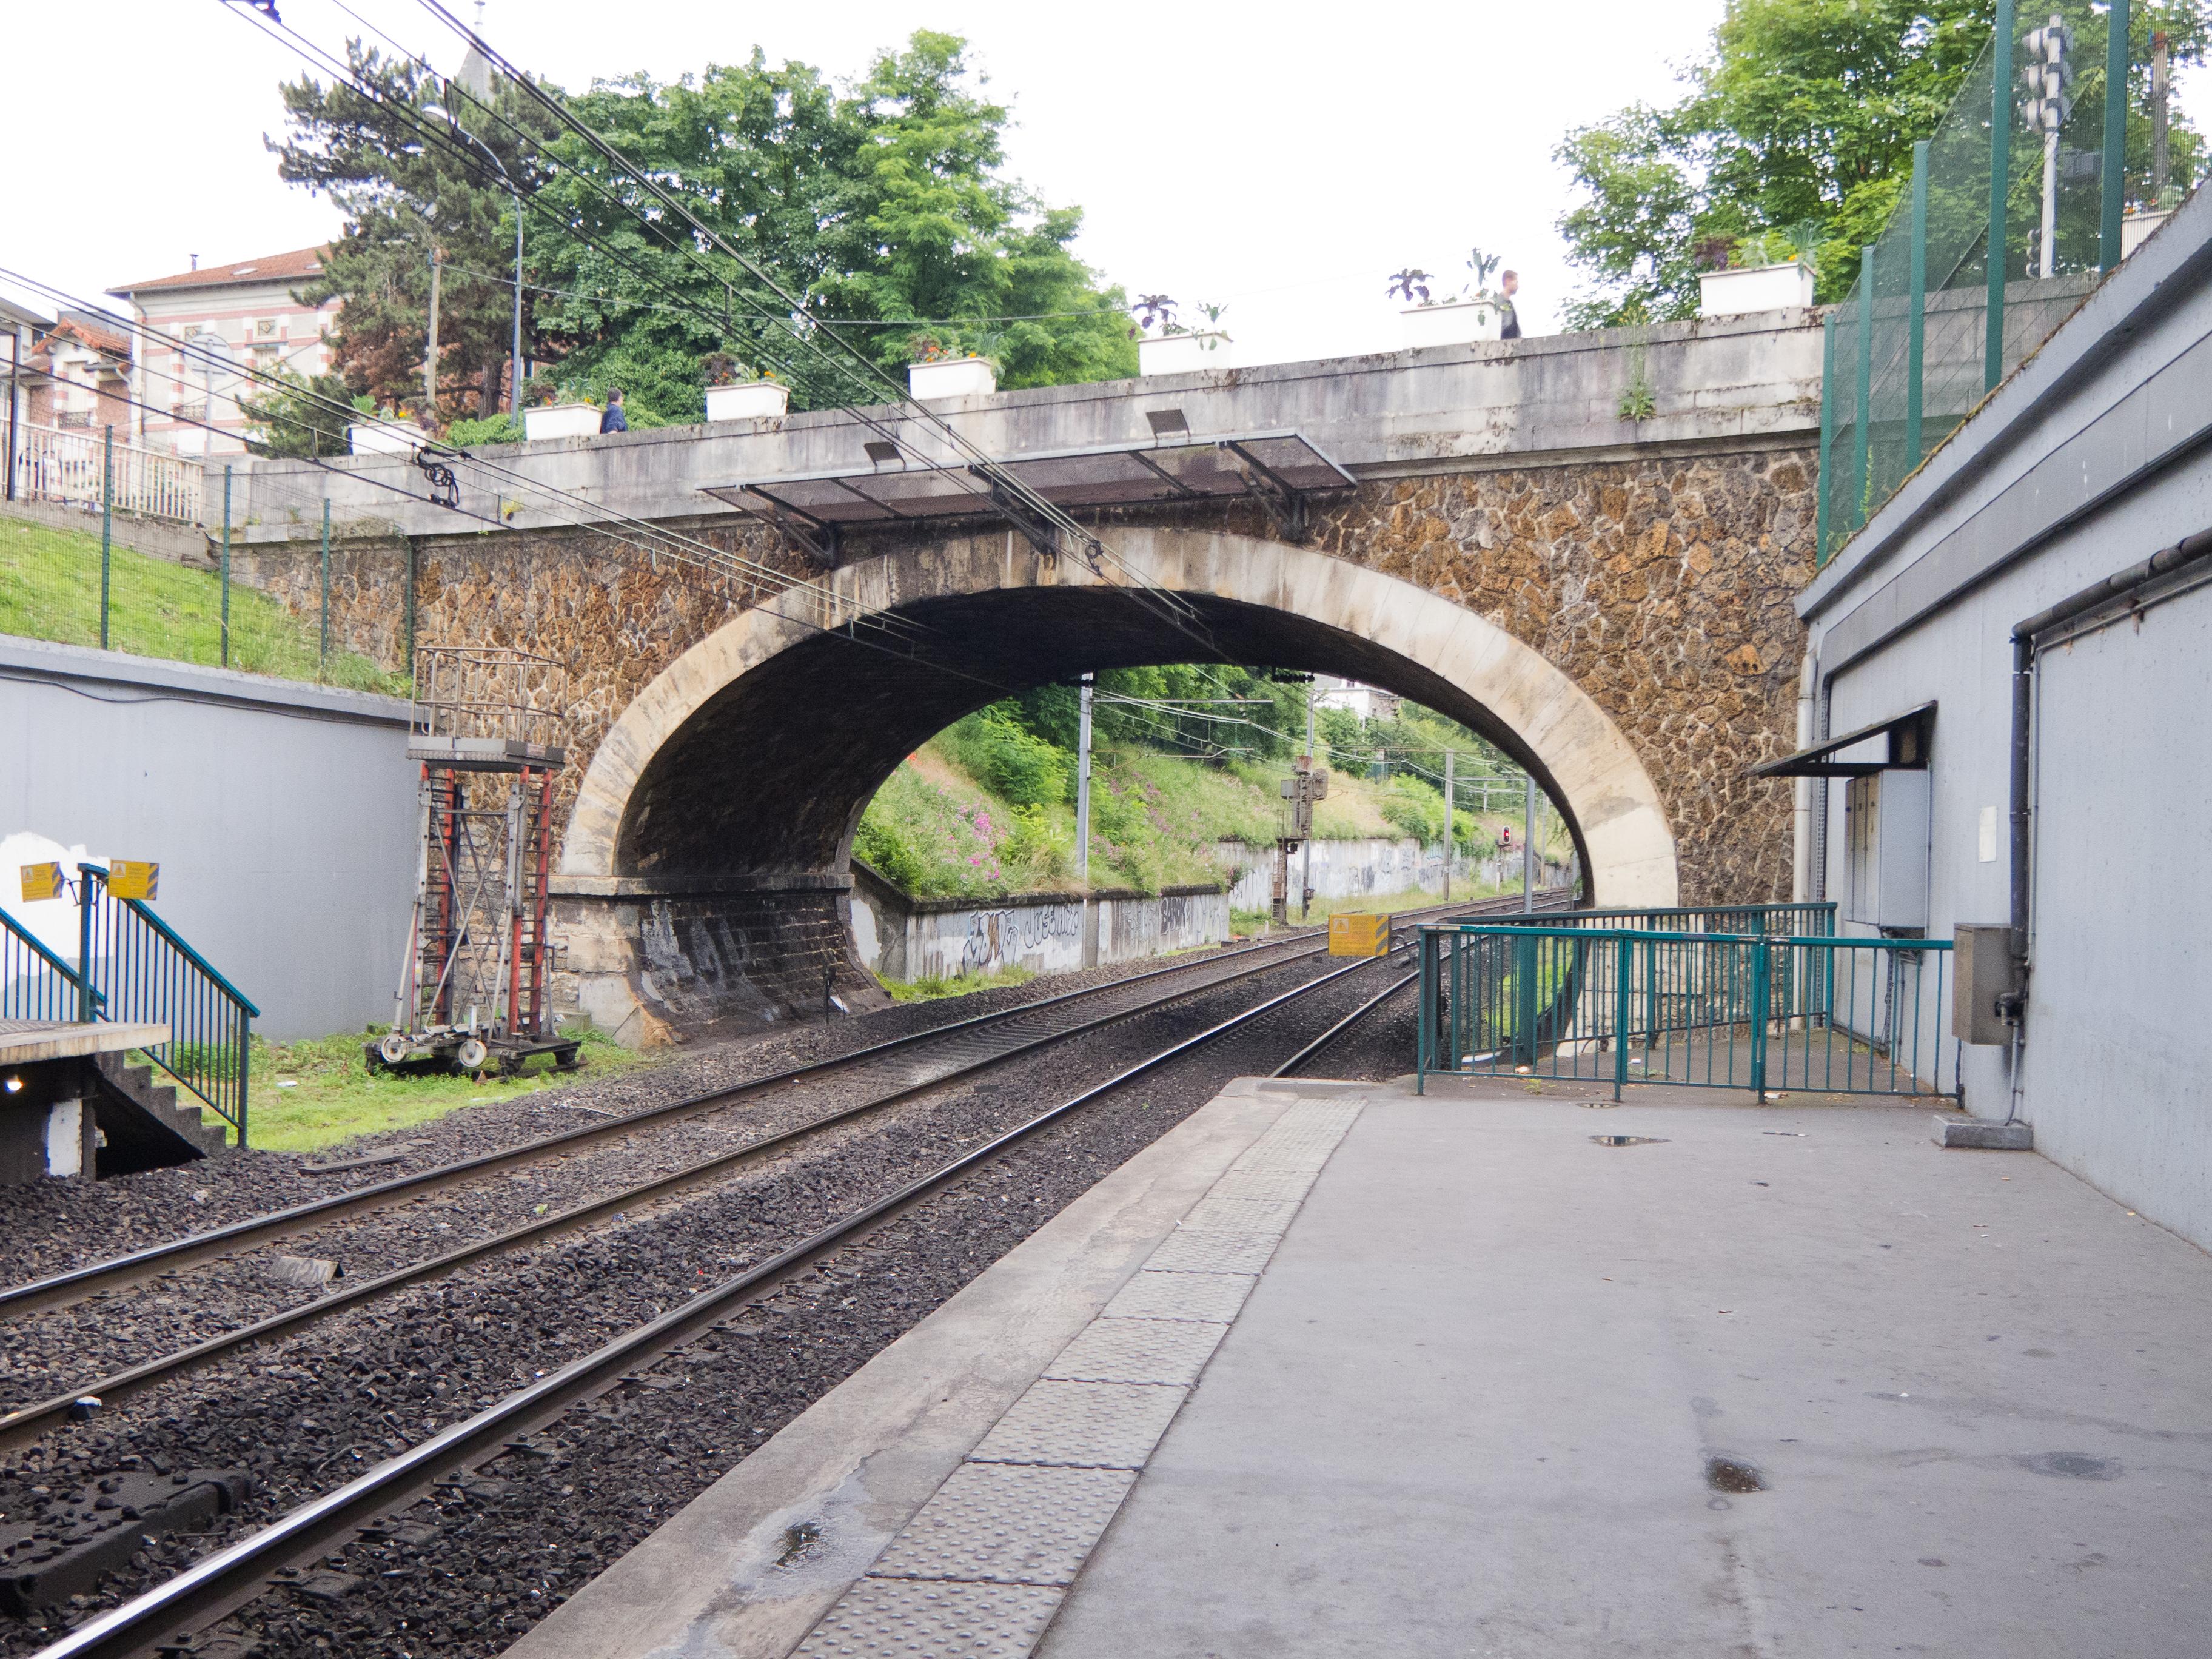 Fontenay Sous Bois Rer images